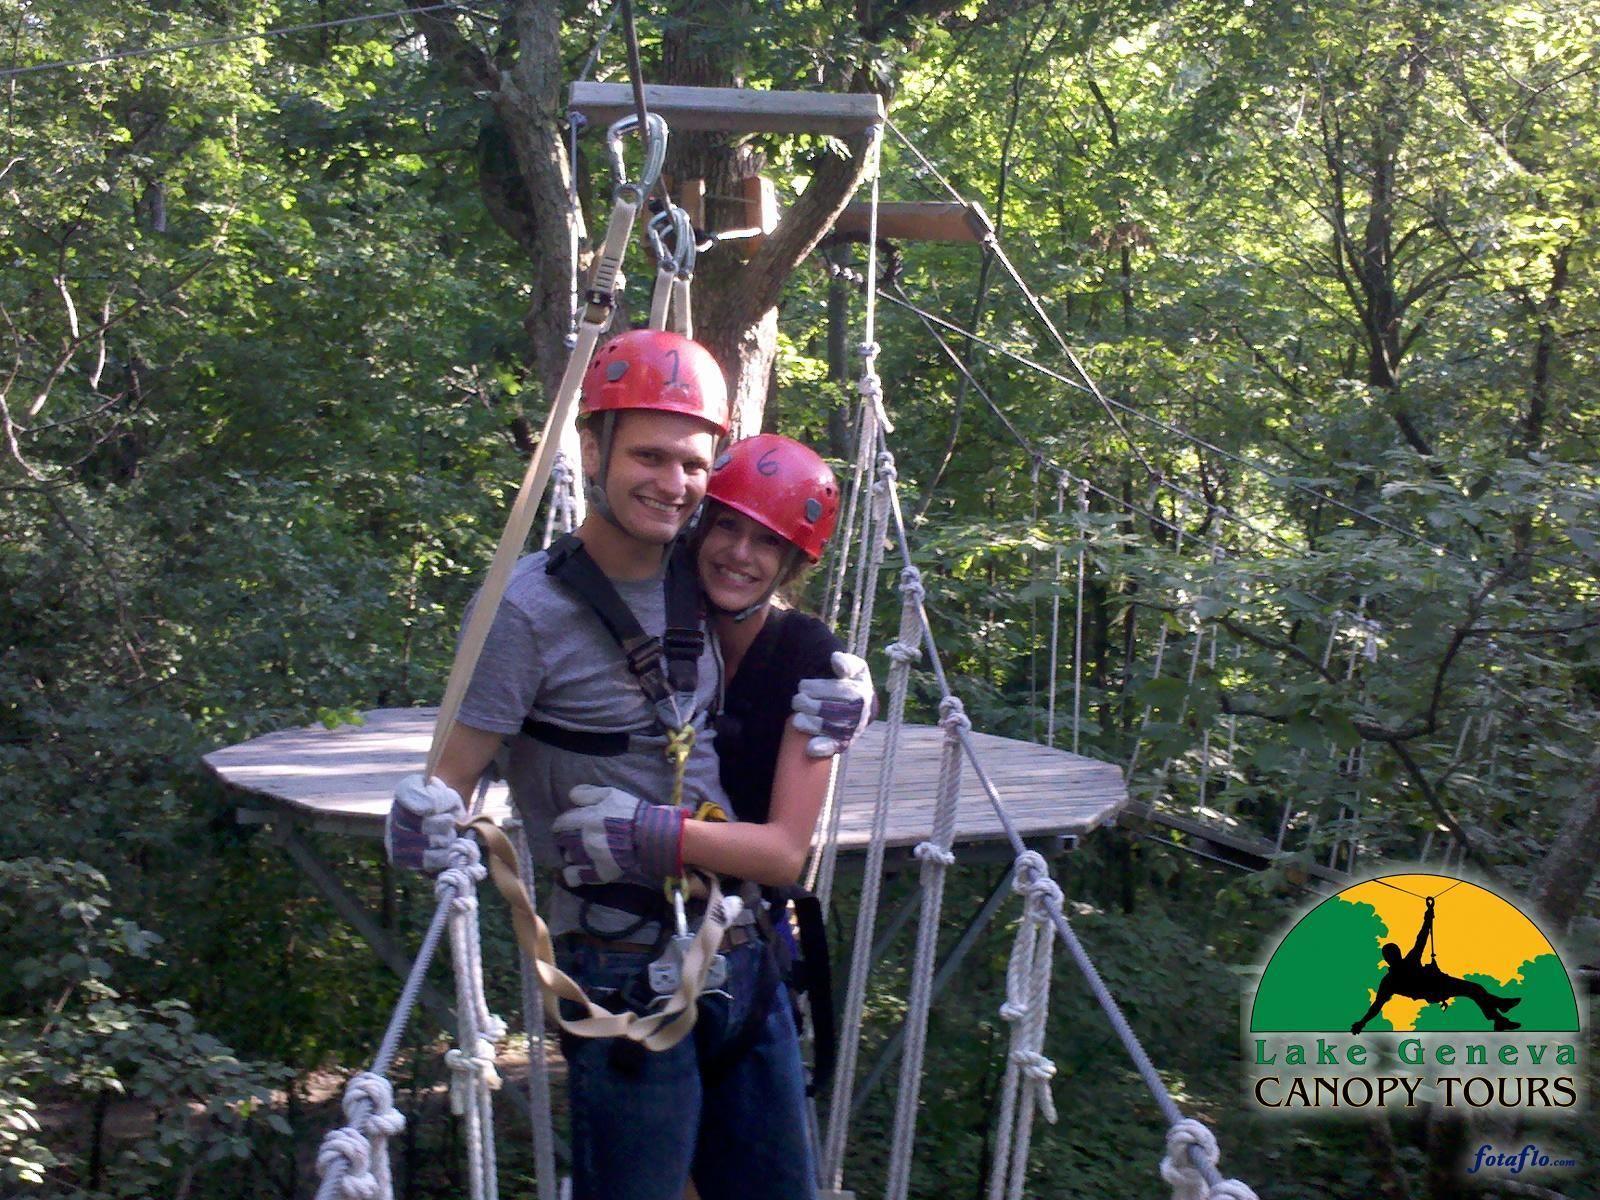 Zip Lining With Lake Geneva Canopy Tours This Little Becker Family In 2020 Ziplining Lake Geneva Lake Geneva Wisconsin